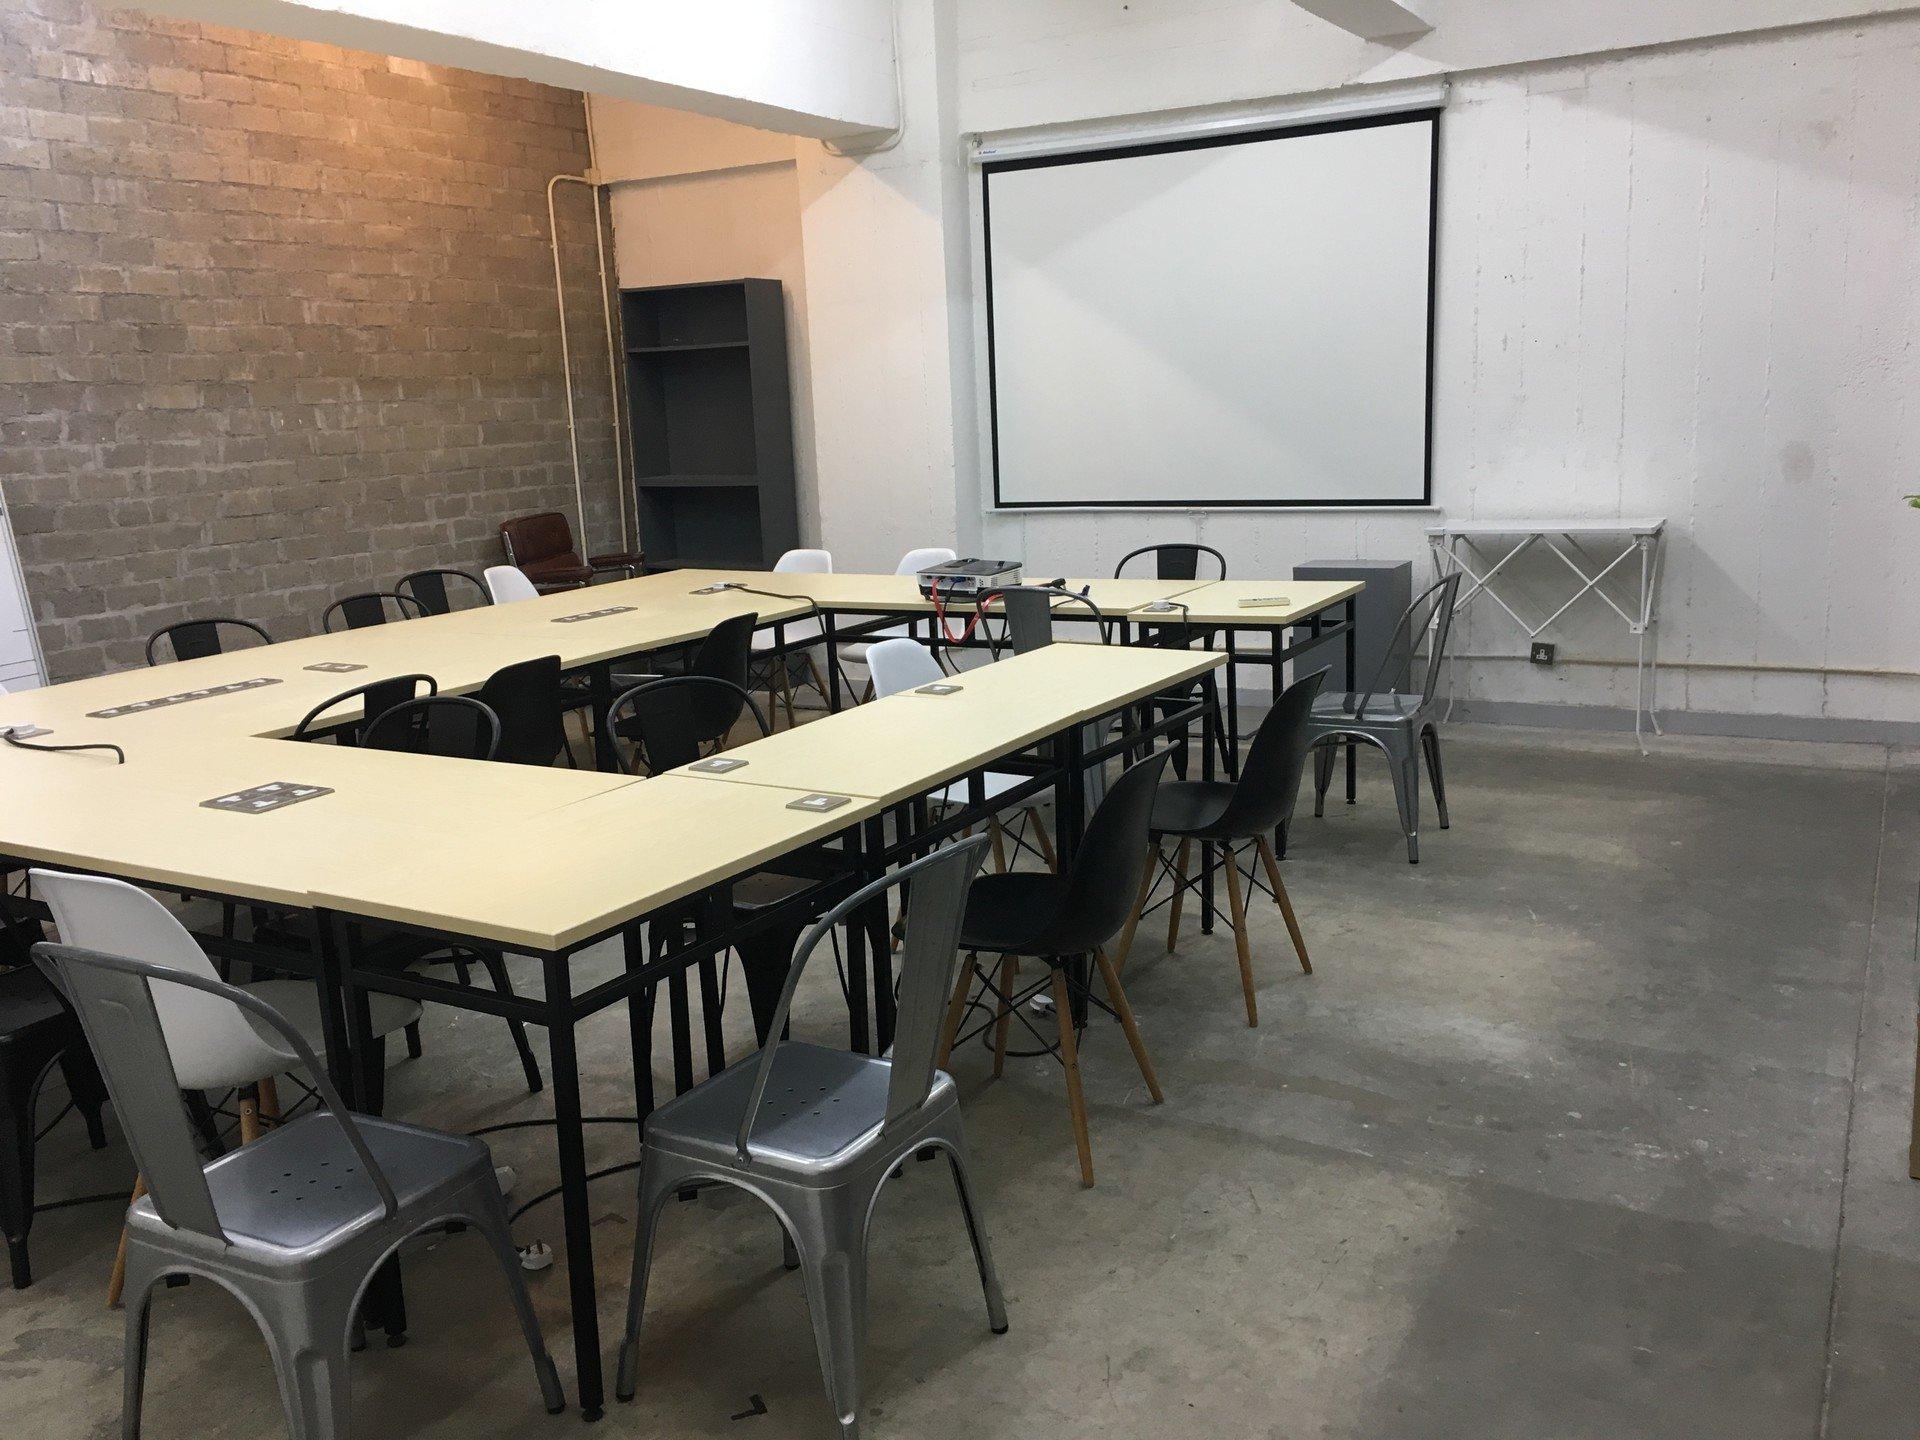 Hong Kong Seminarräume Meeting room The Loft - Entrepreneurship Seminar image 1